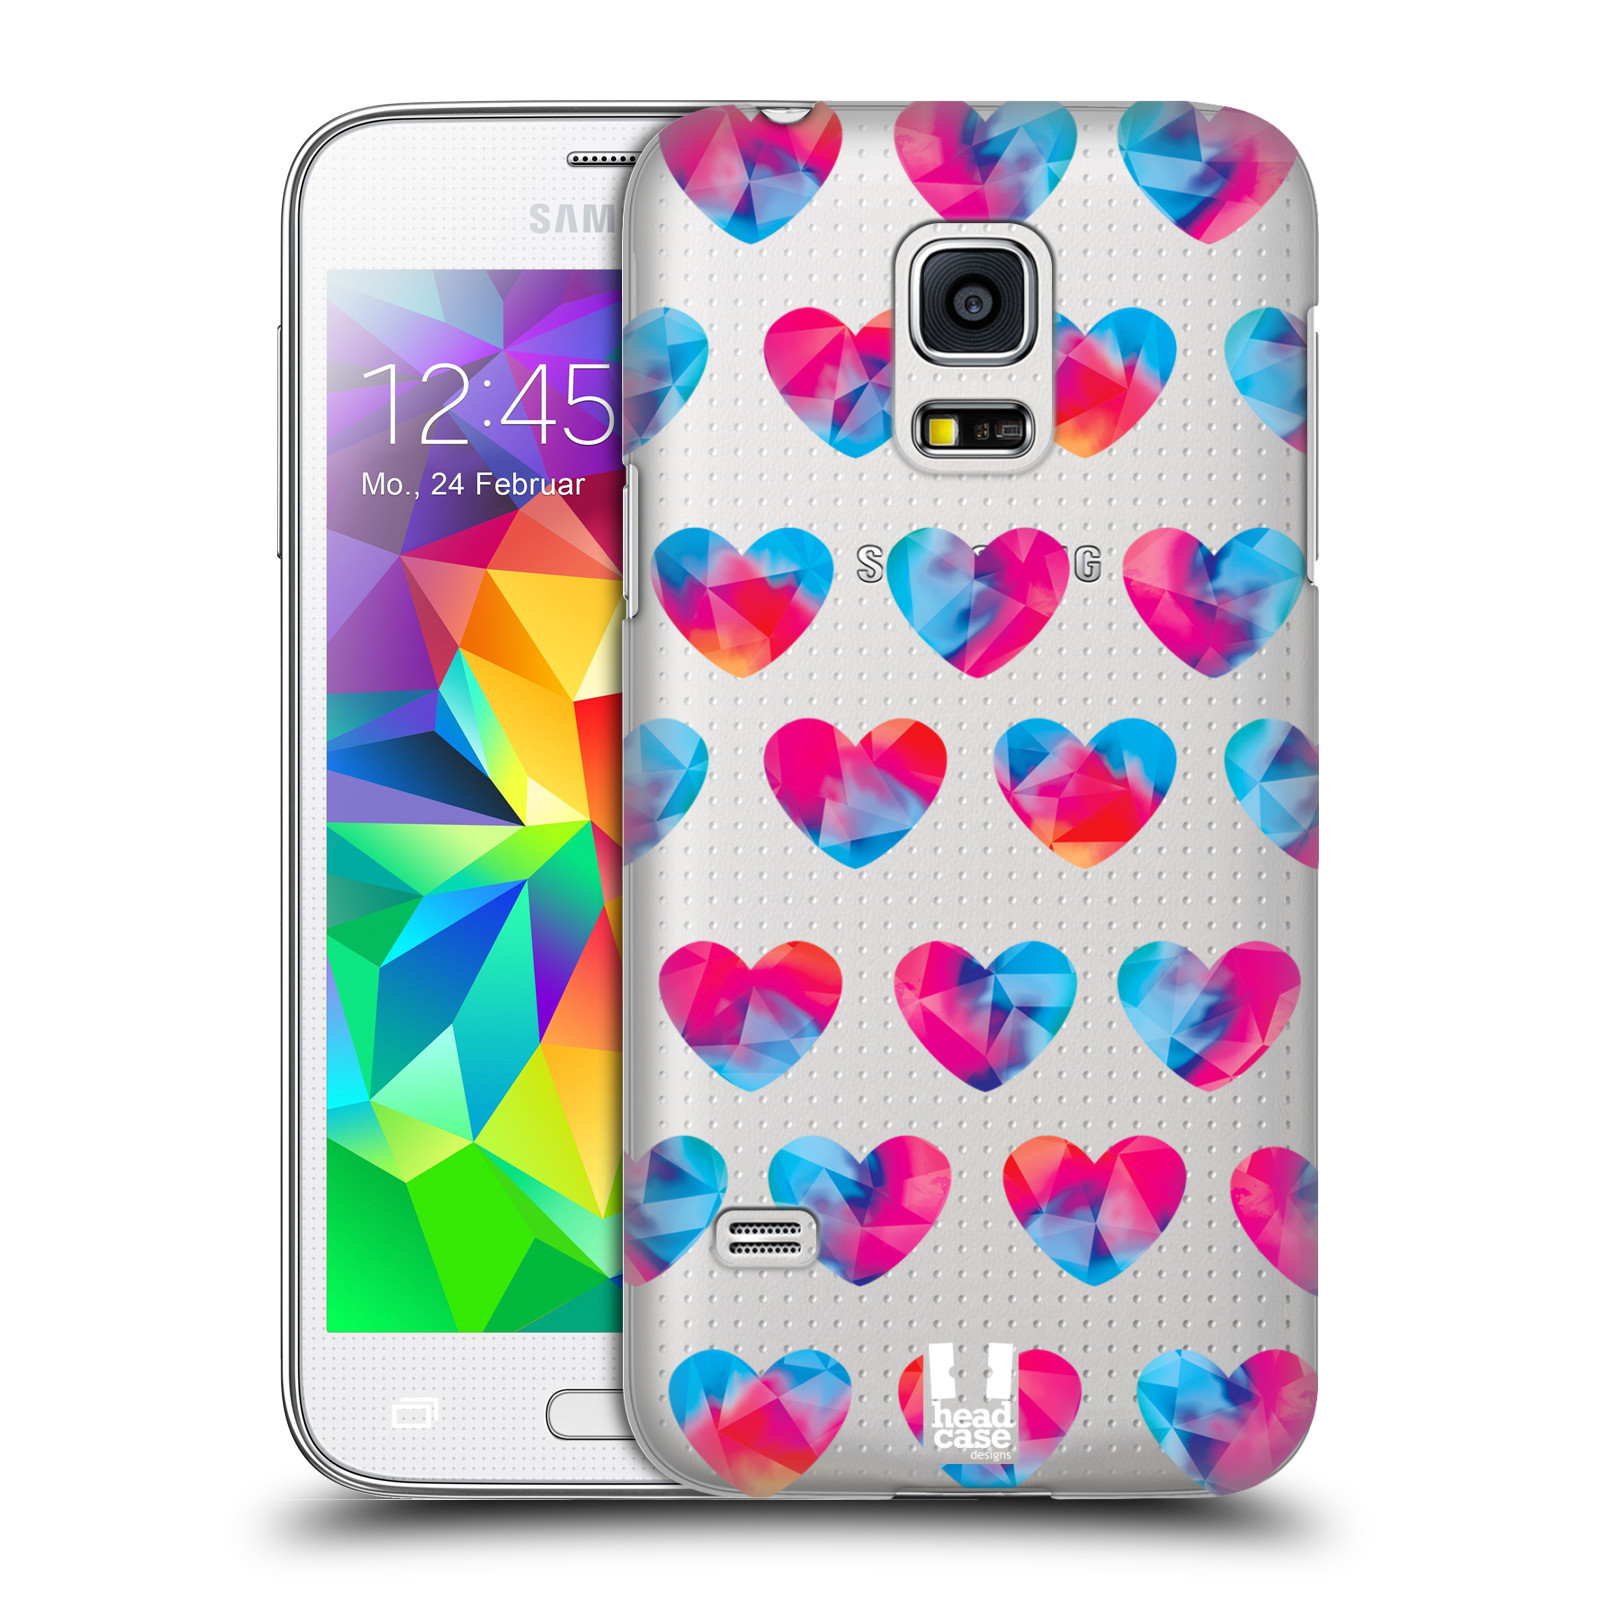 Plastové pouzdro na mobil Samsung Galaxy S5 Mini - Head Case - Srdíčka hrající barvami